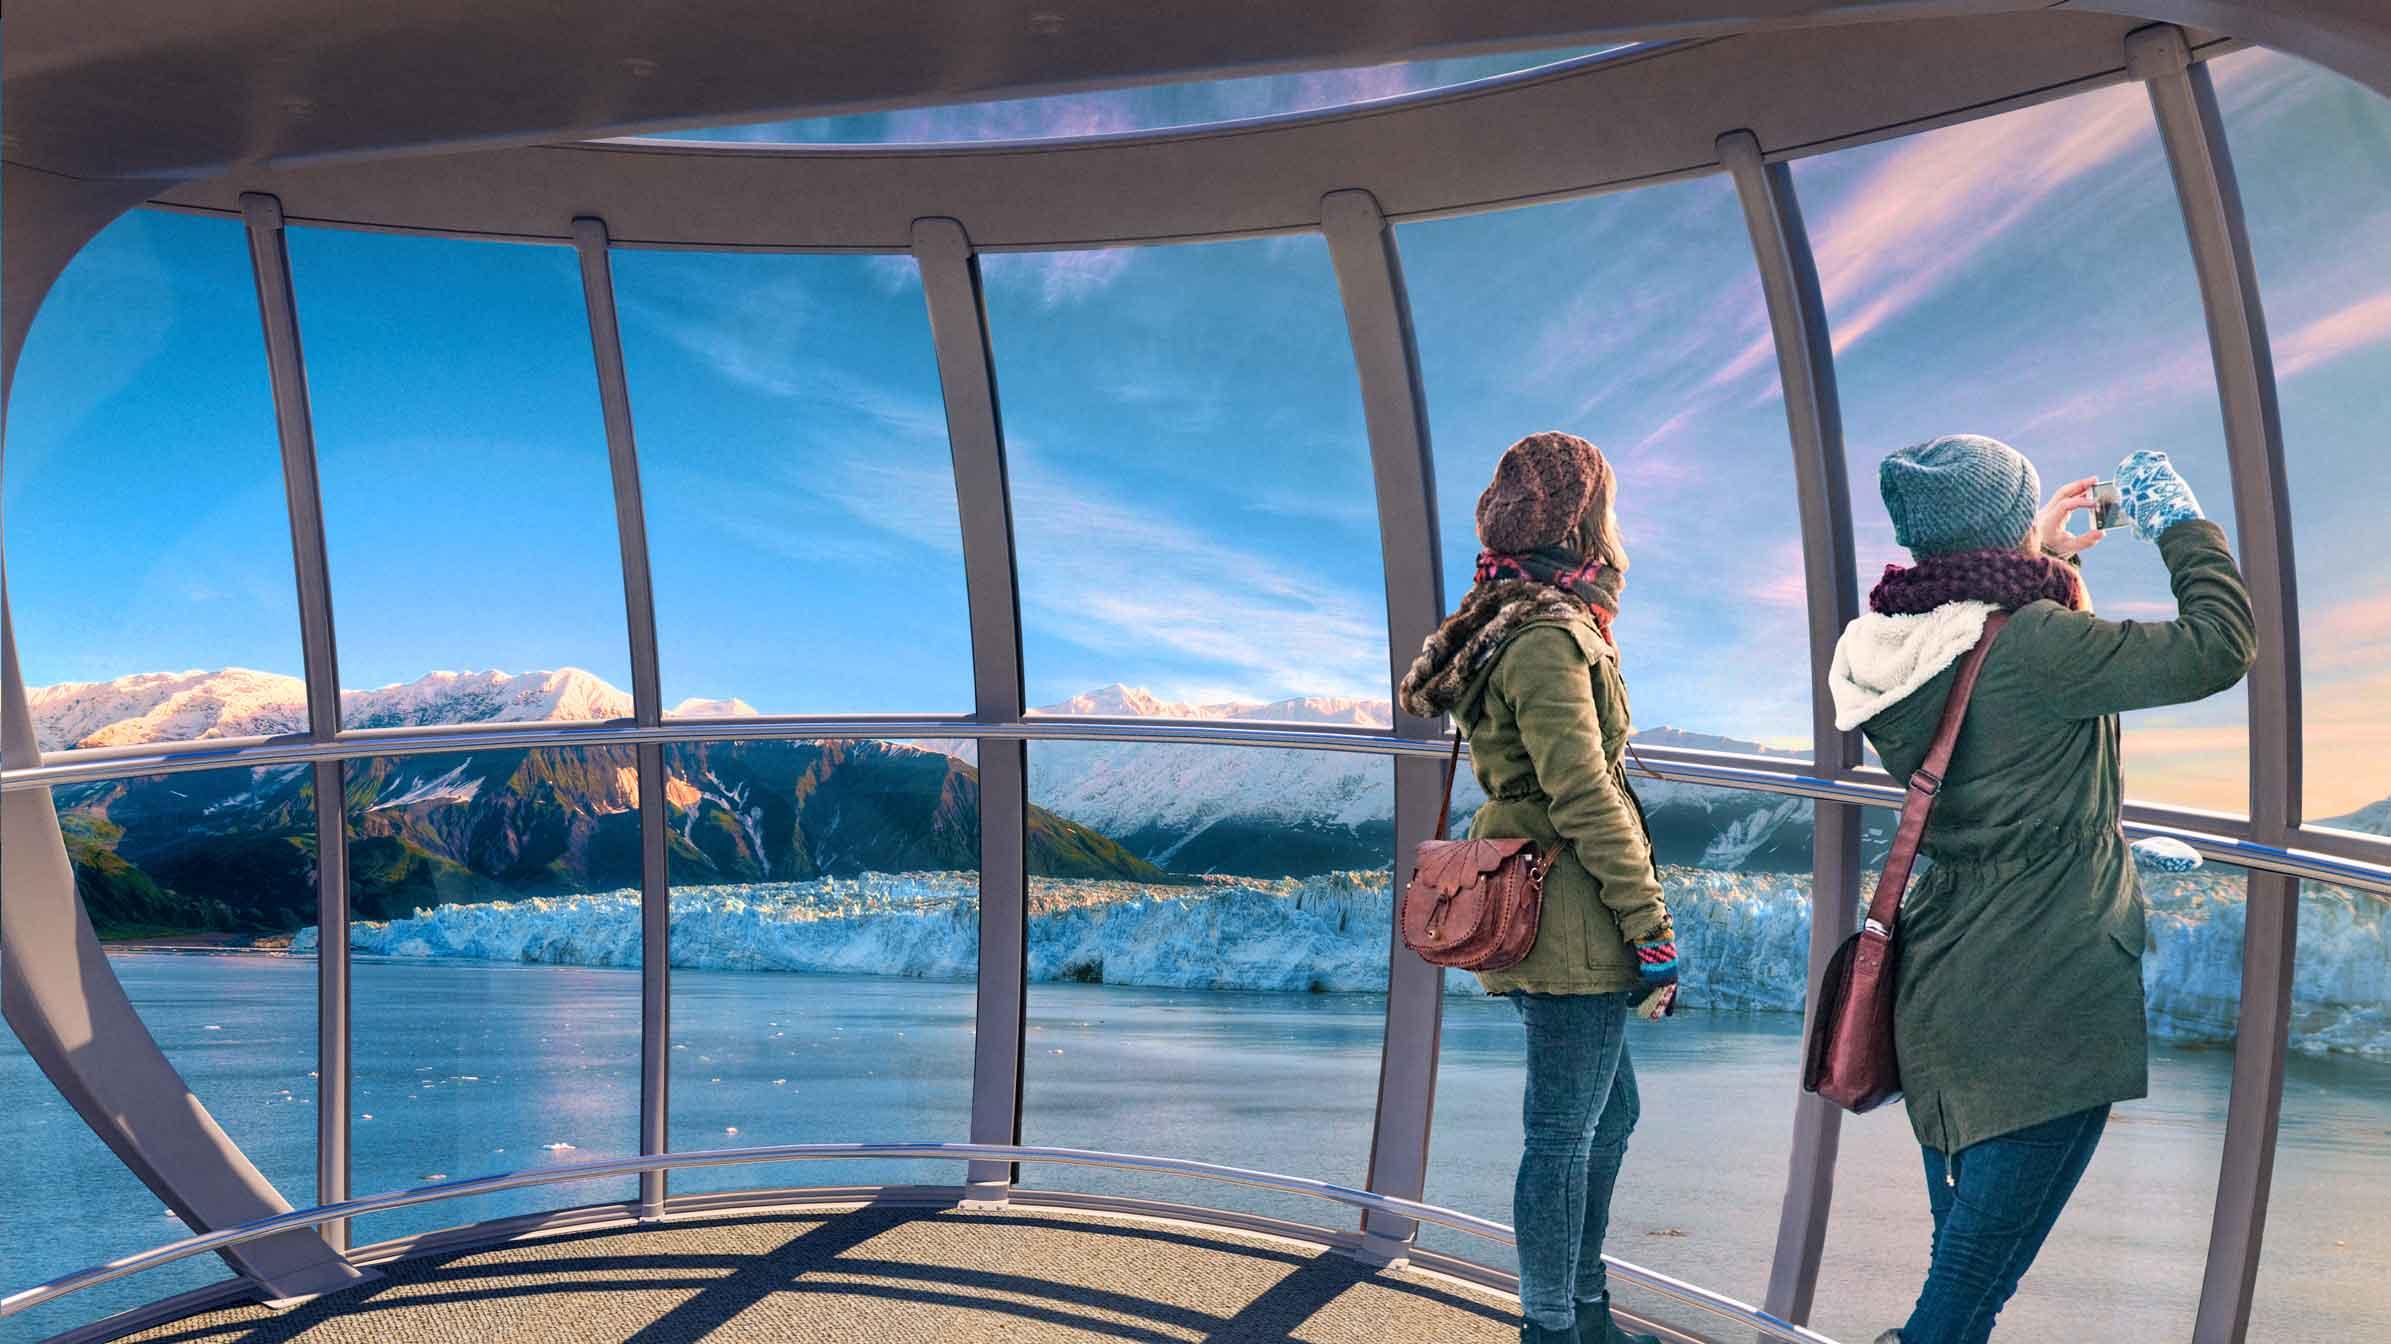 15 amazing activities on a cruise ship   Cruise.Blog